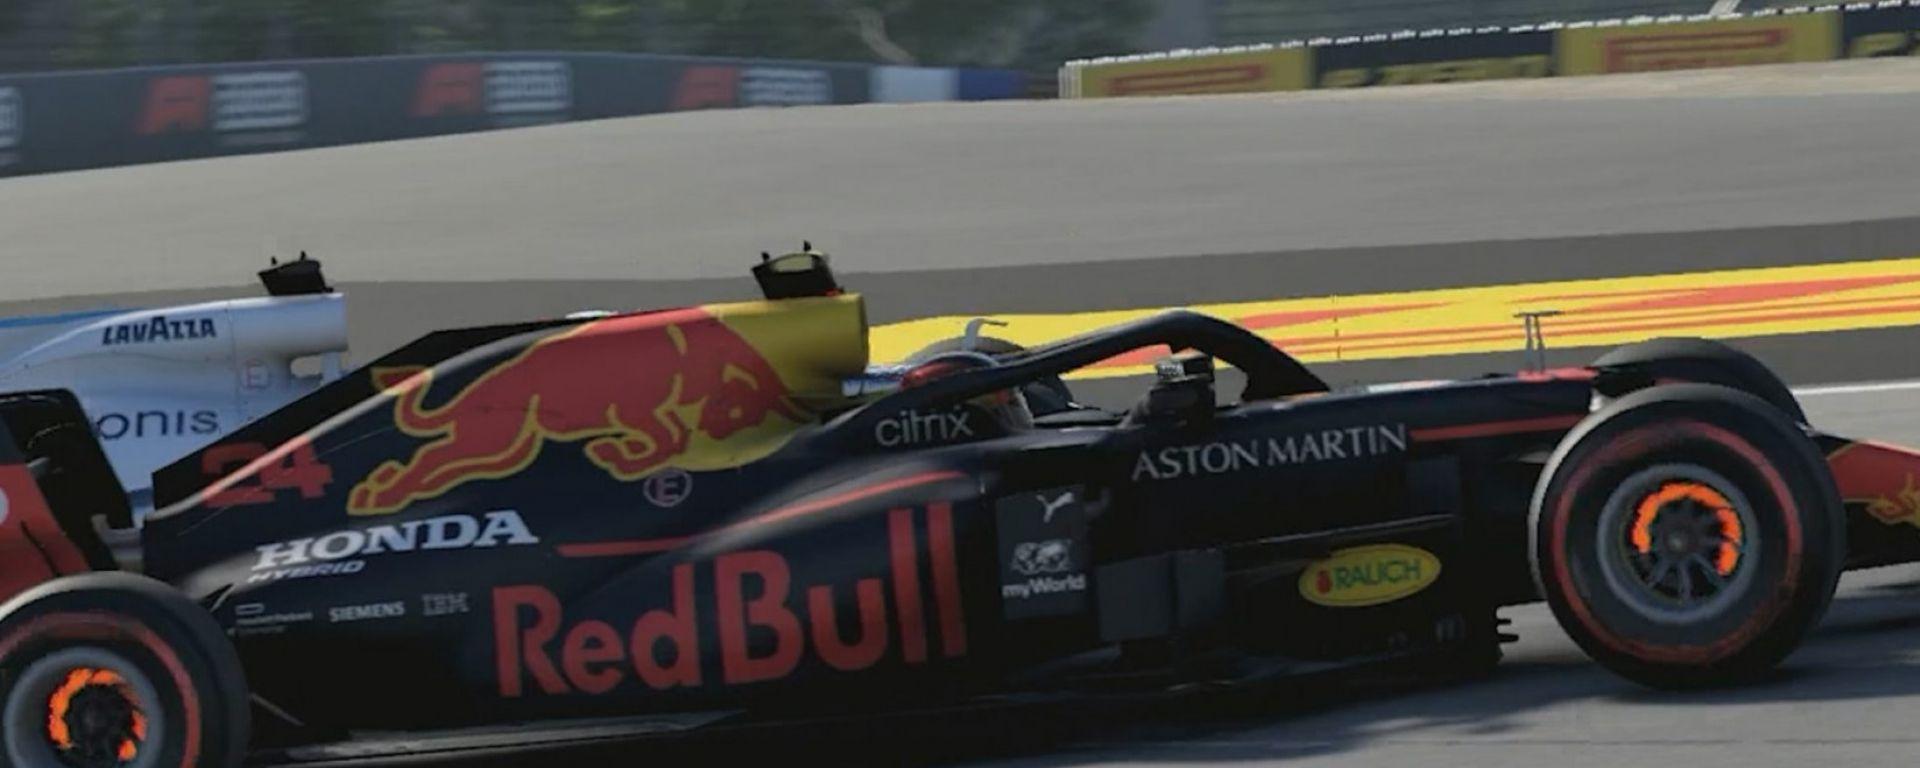 F1 Esport Pro Series 2020